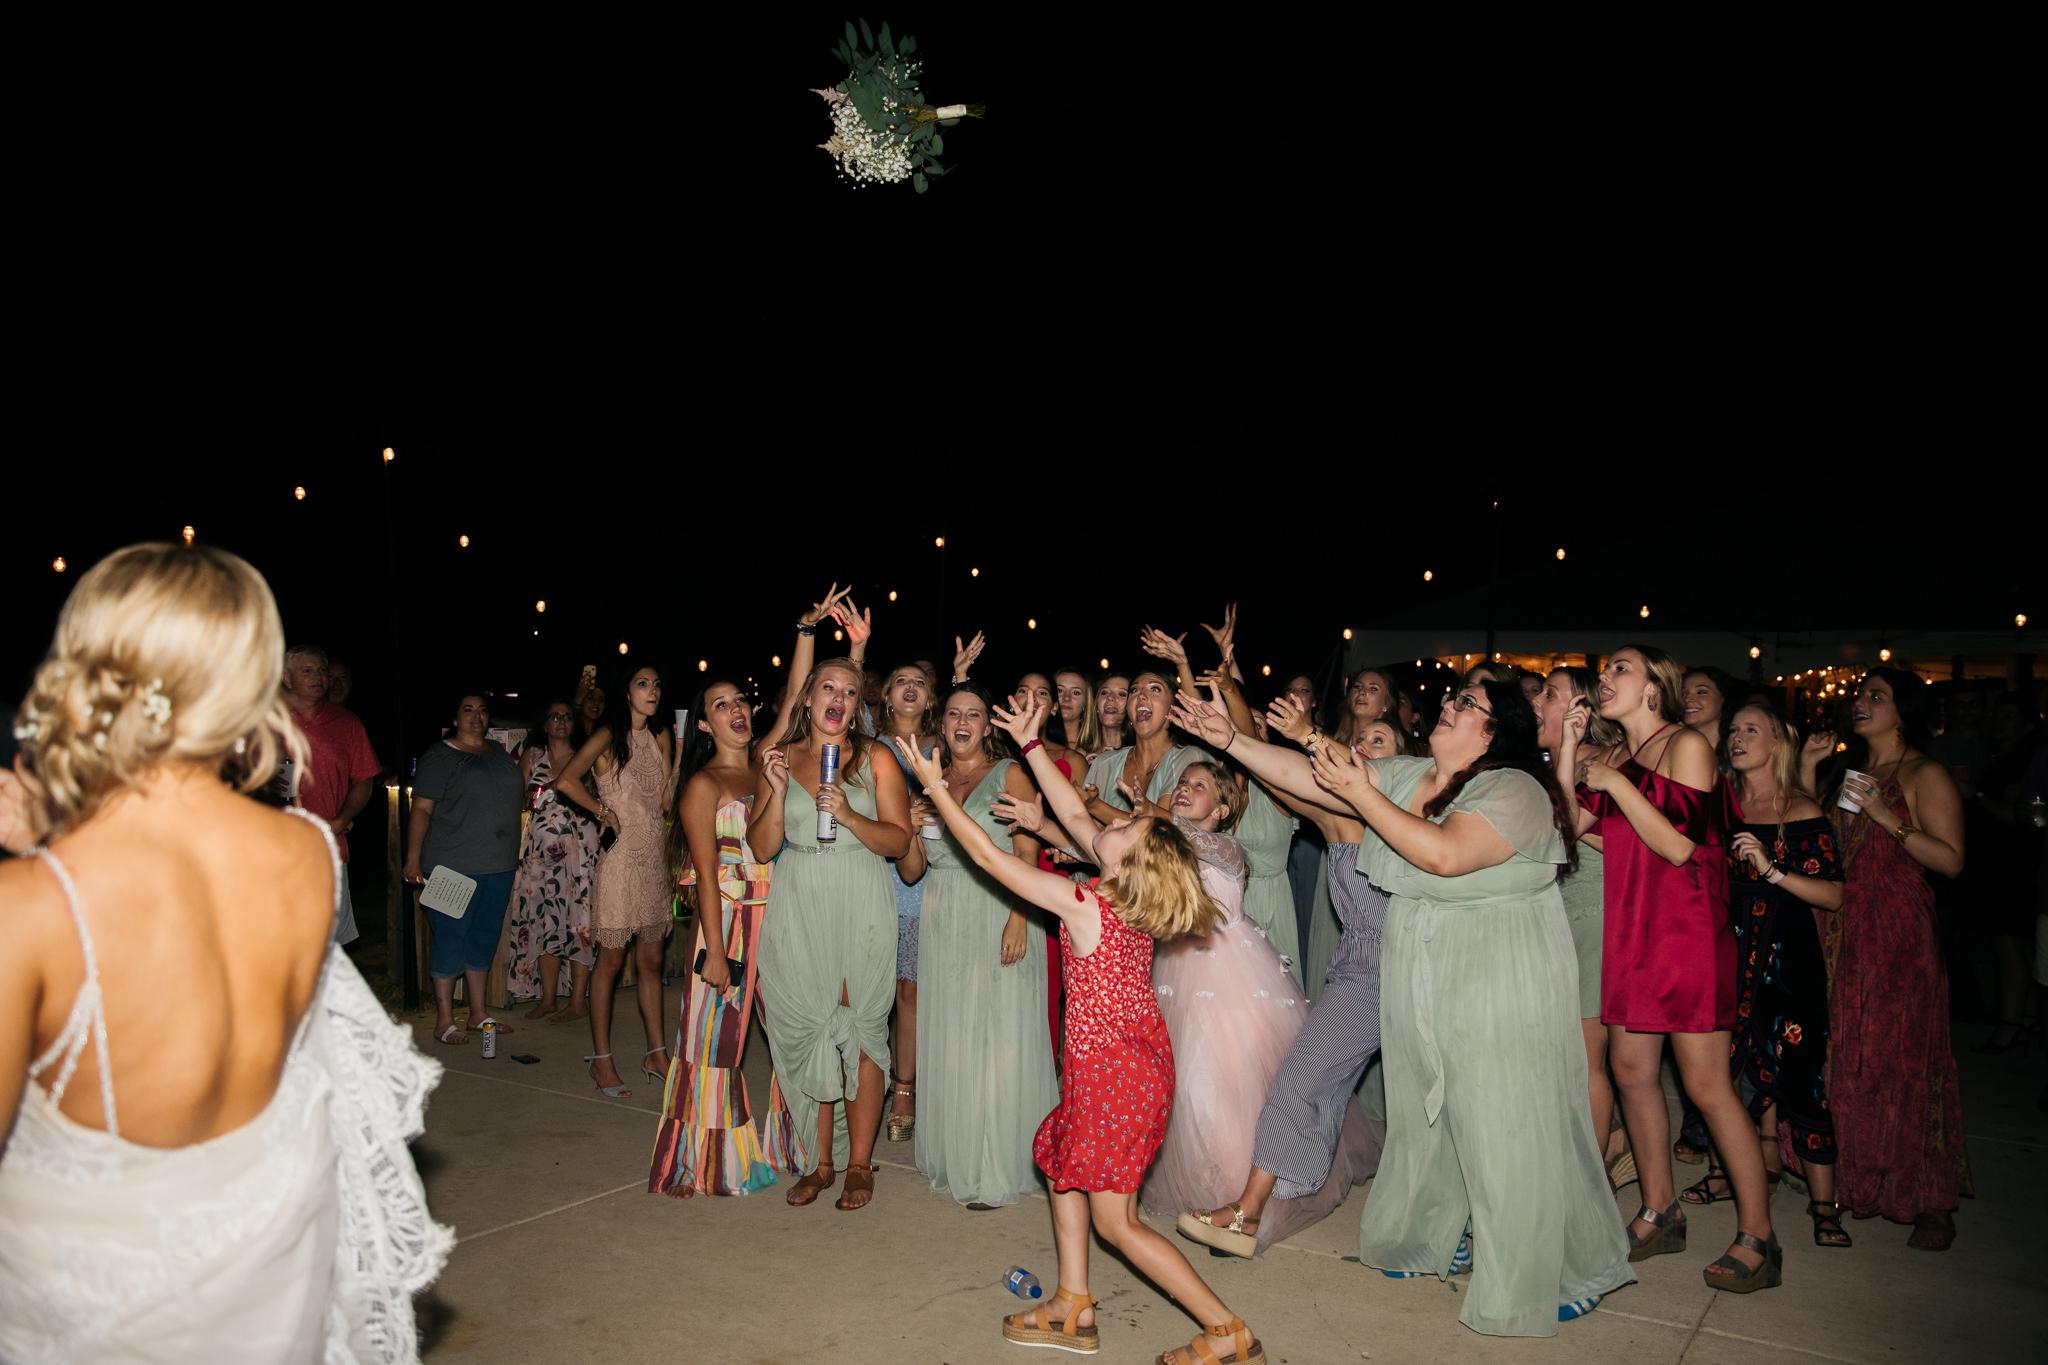 backyard-wedding-thewarmtharoundyou-lexy-branson-96.jpg